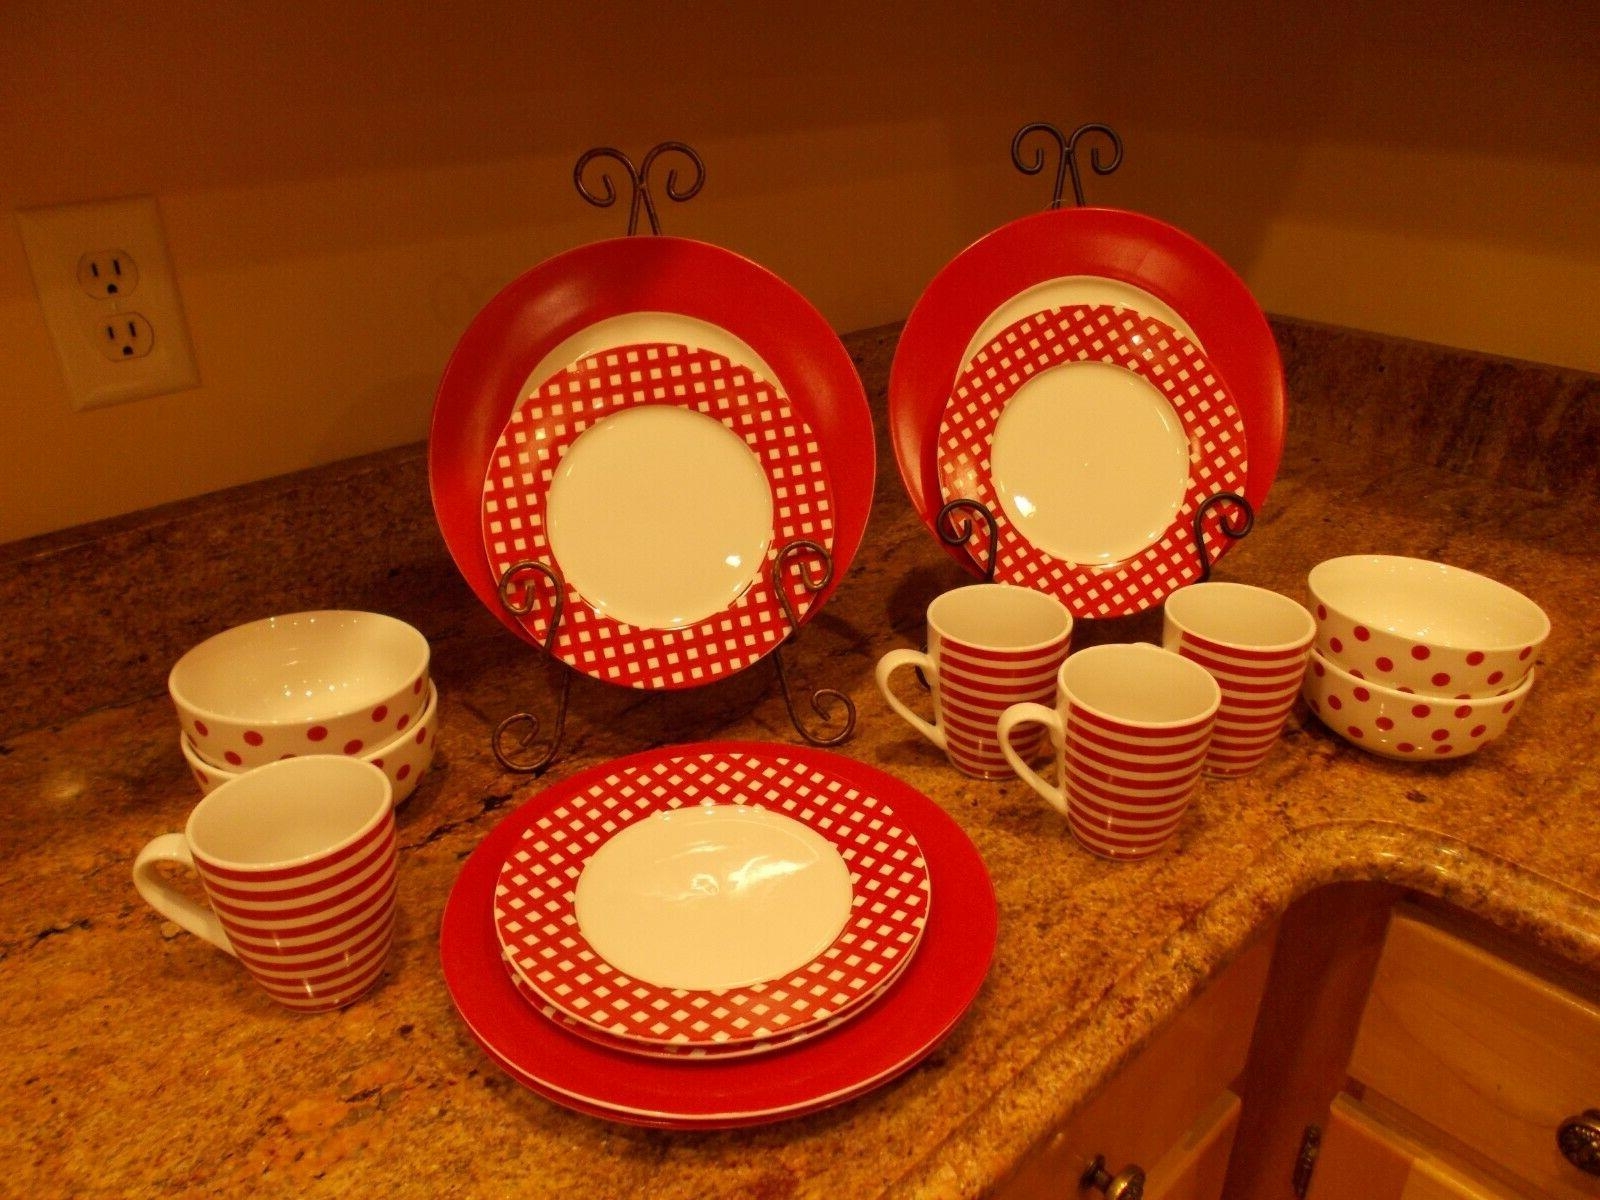 Pfaltzgraff Everyday 16 Piece Dinnerware Set - NEW